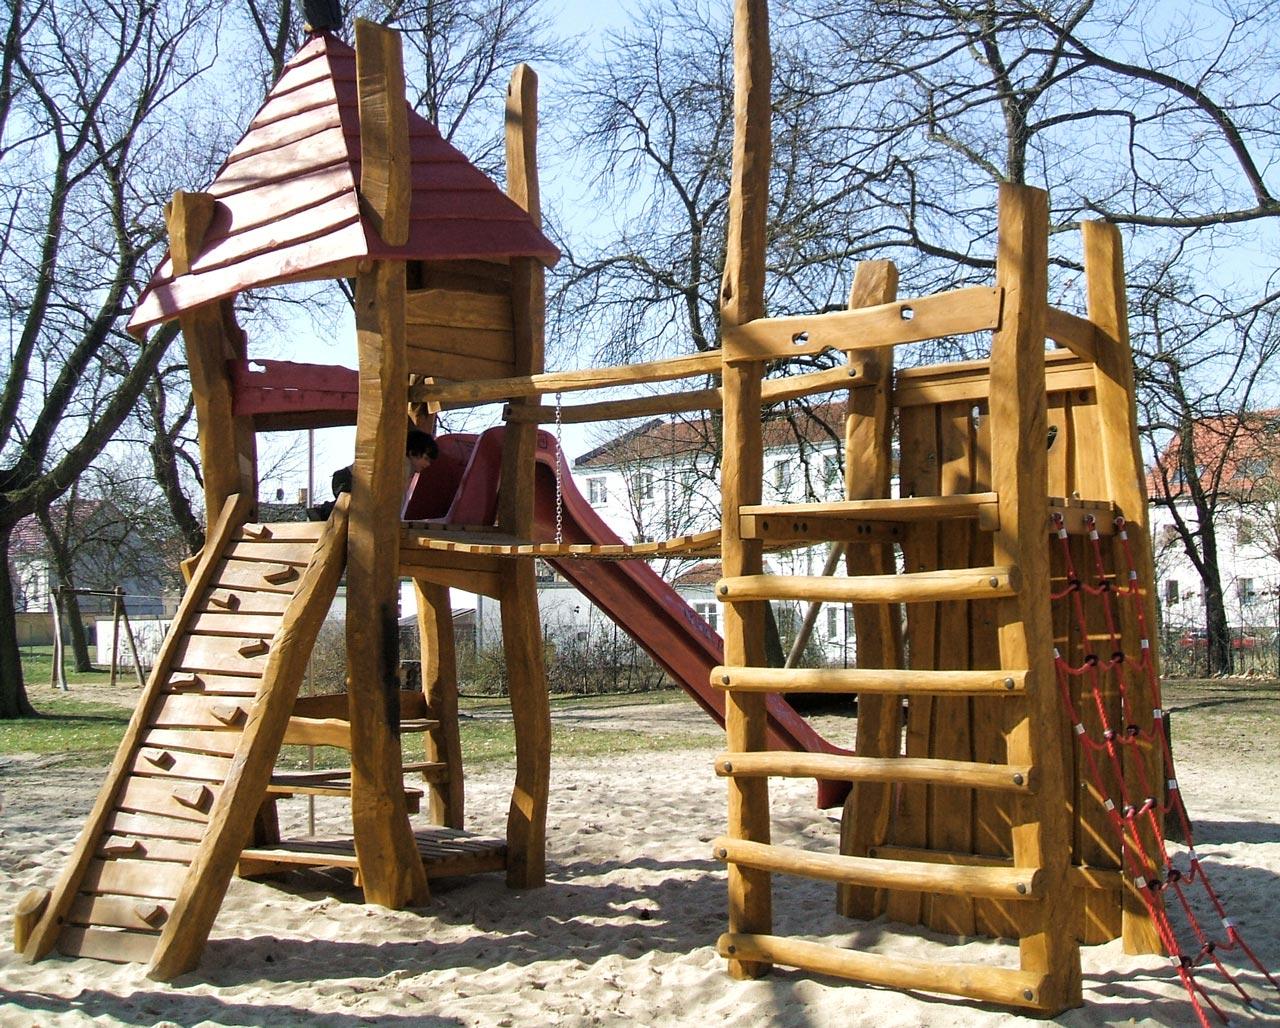 A 45 Spielplatz aus Holz